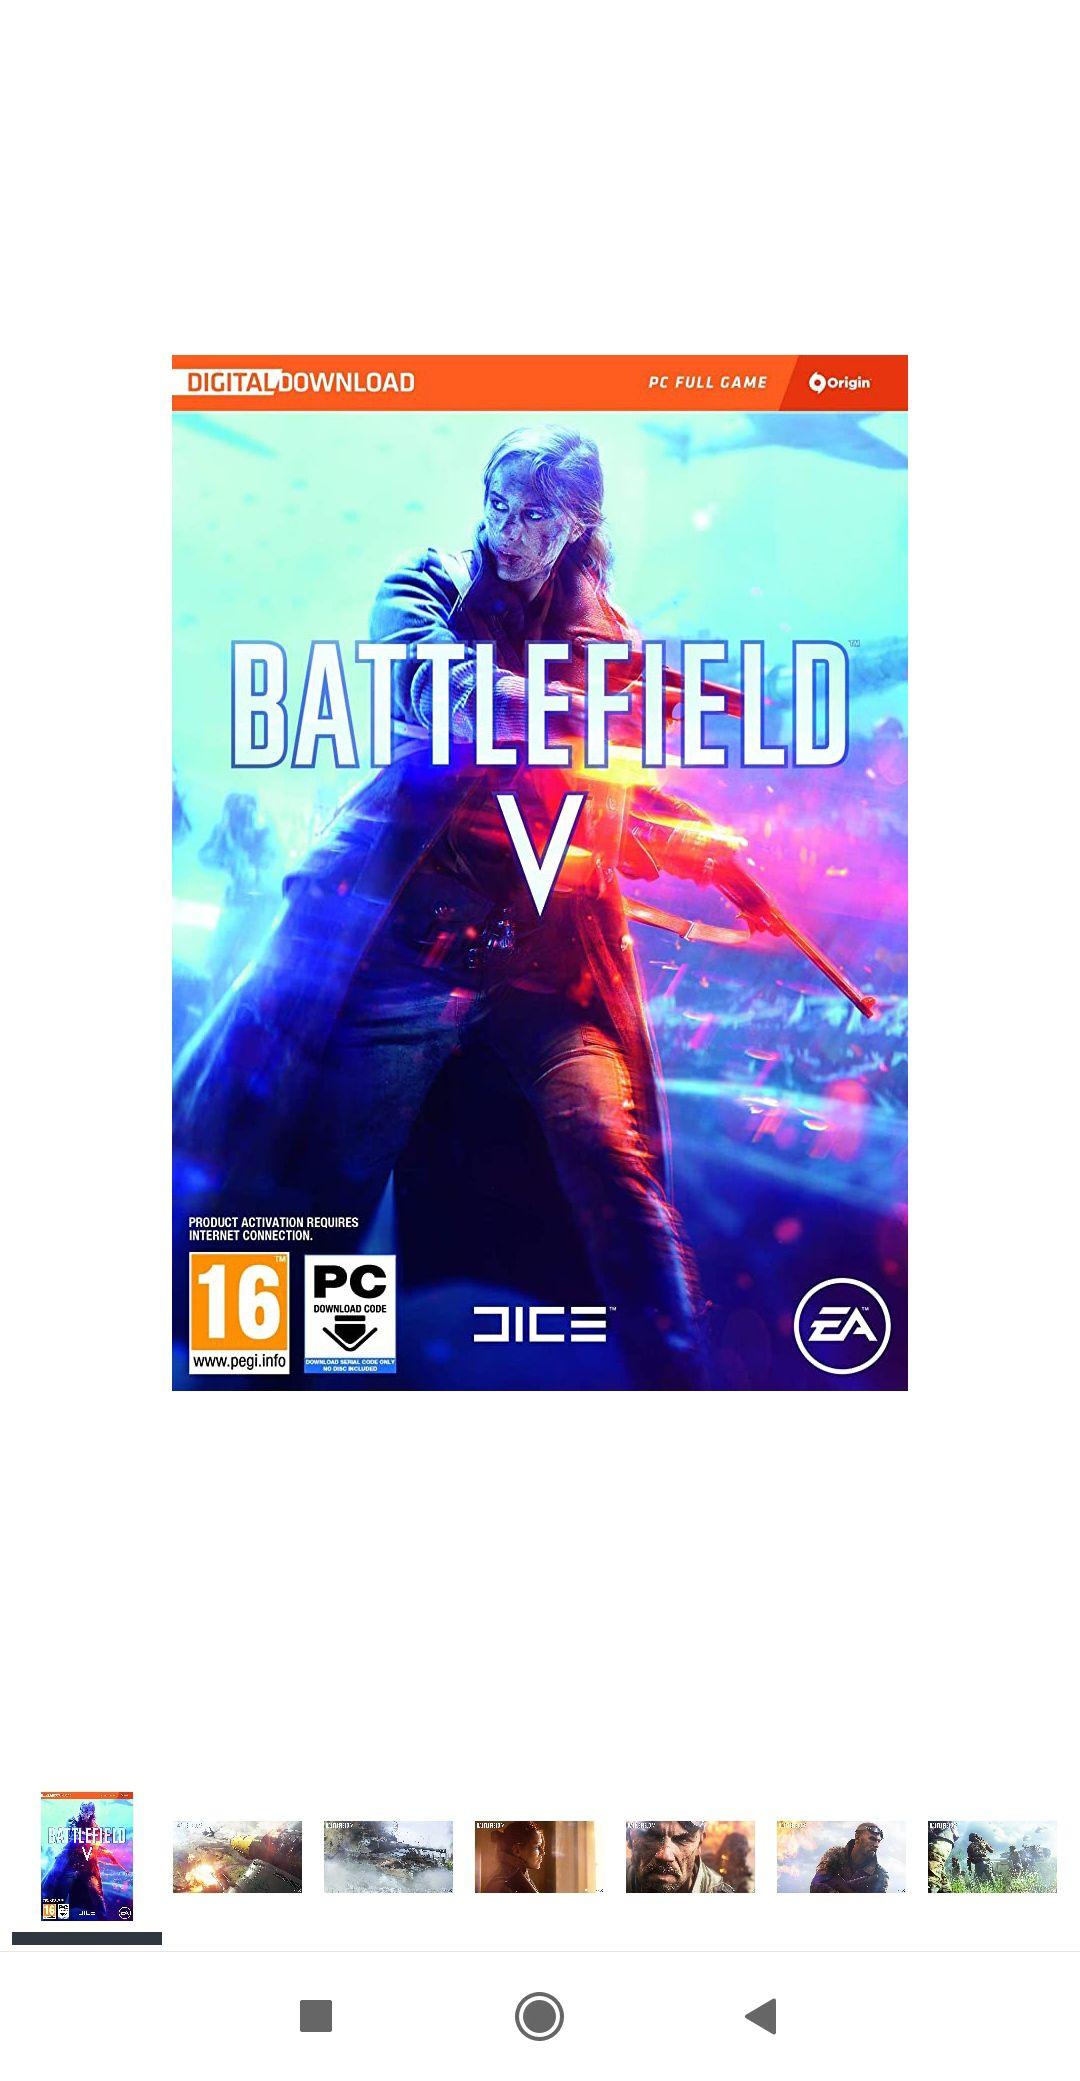 Battlefield 5 (V) PC